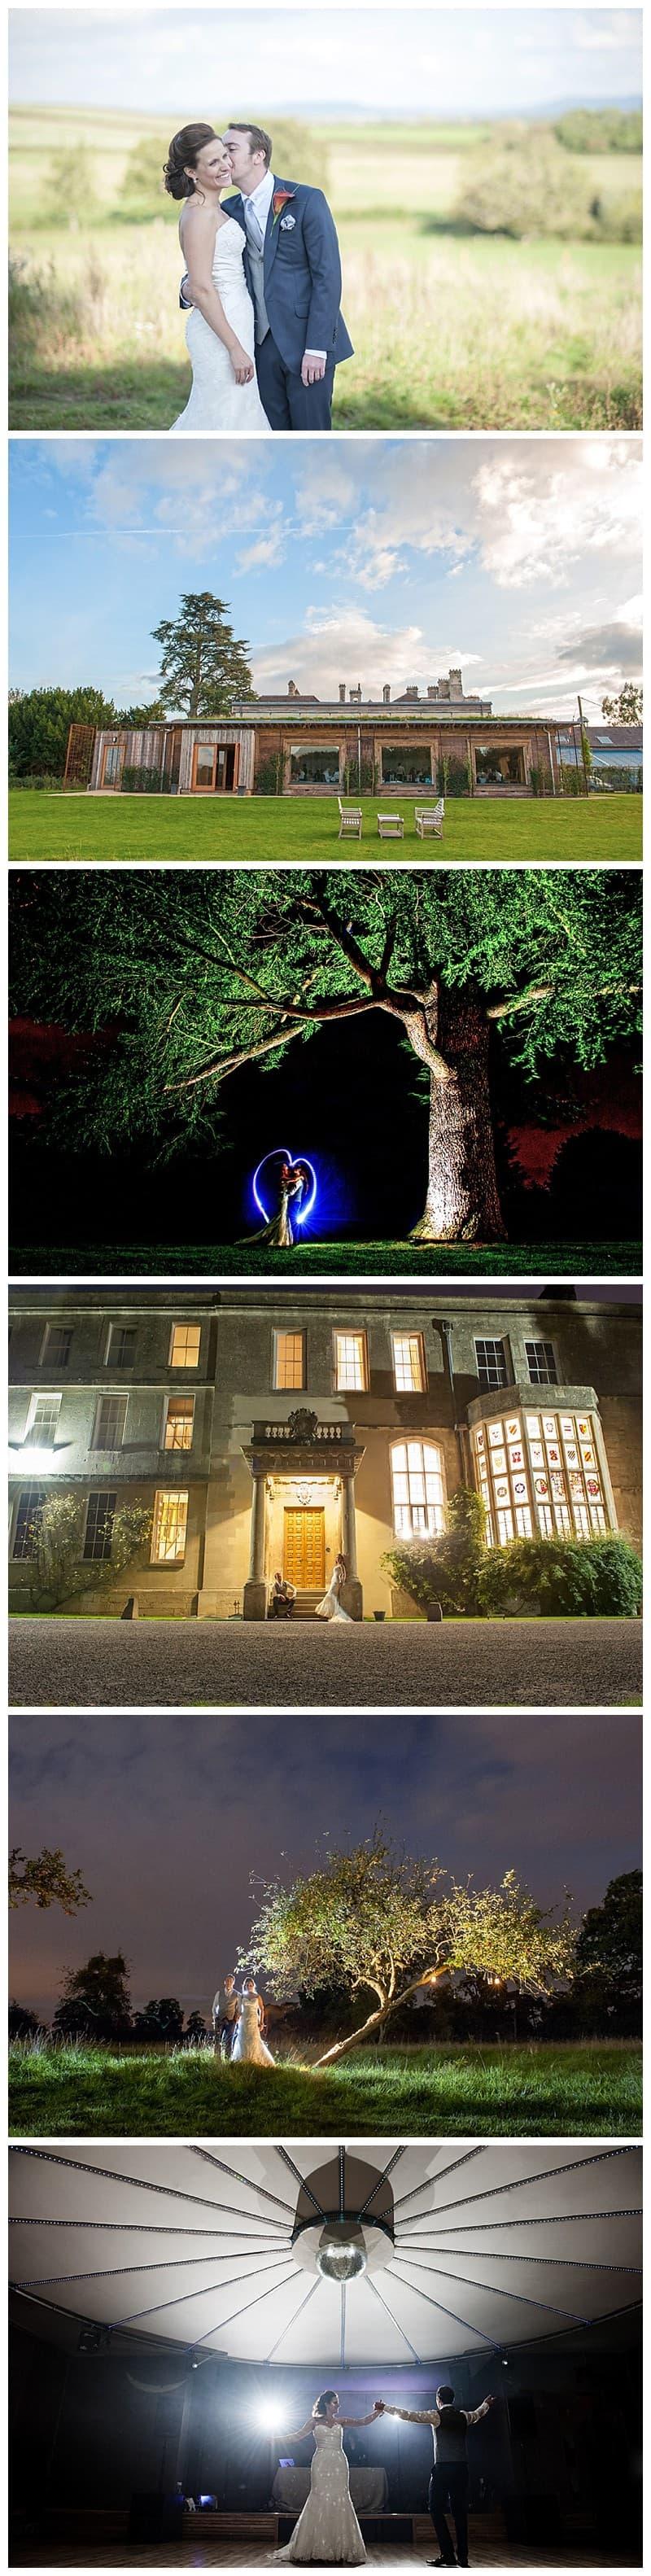 Dan & Frida's Elmore Court Wedding, Gloucestershire. Benjamin Wetherall Photography, London0007